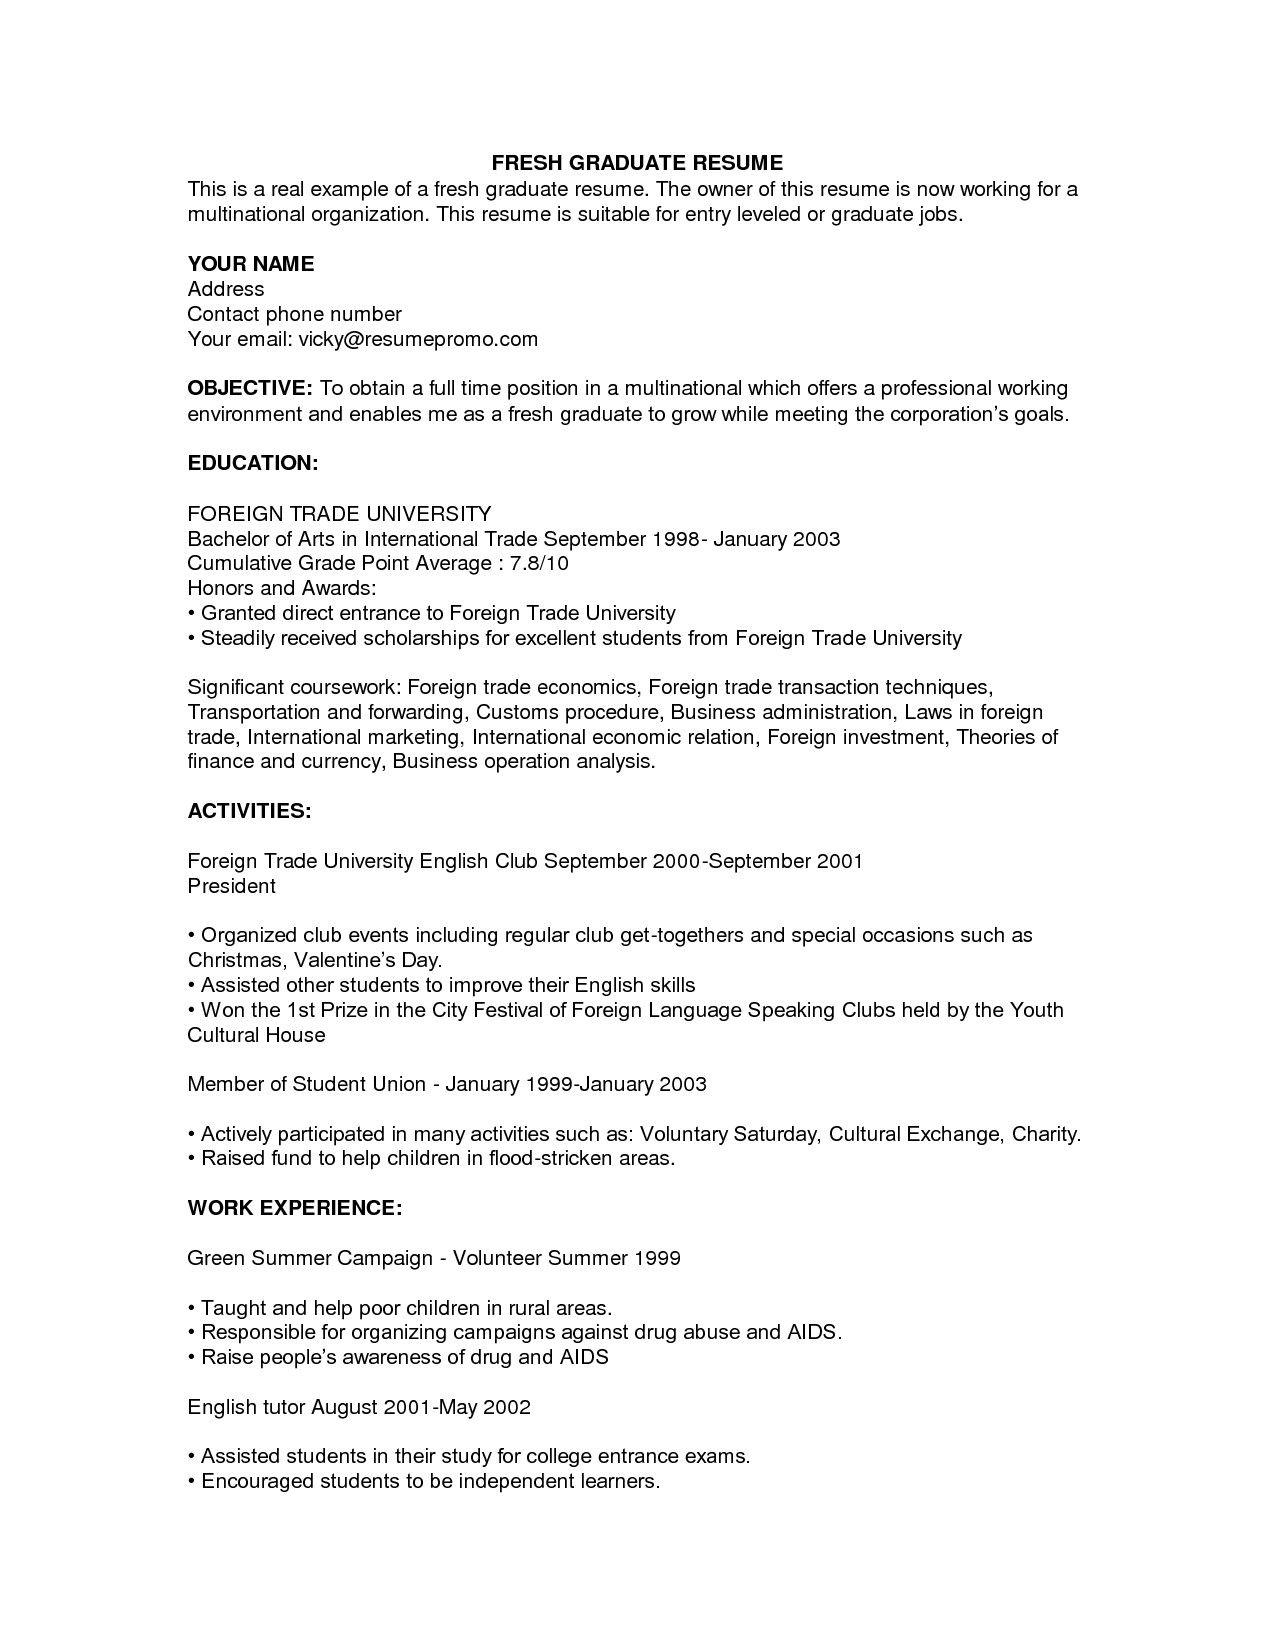 Basic Resume Format Examples ]   Basic Resume Format Examples